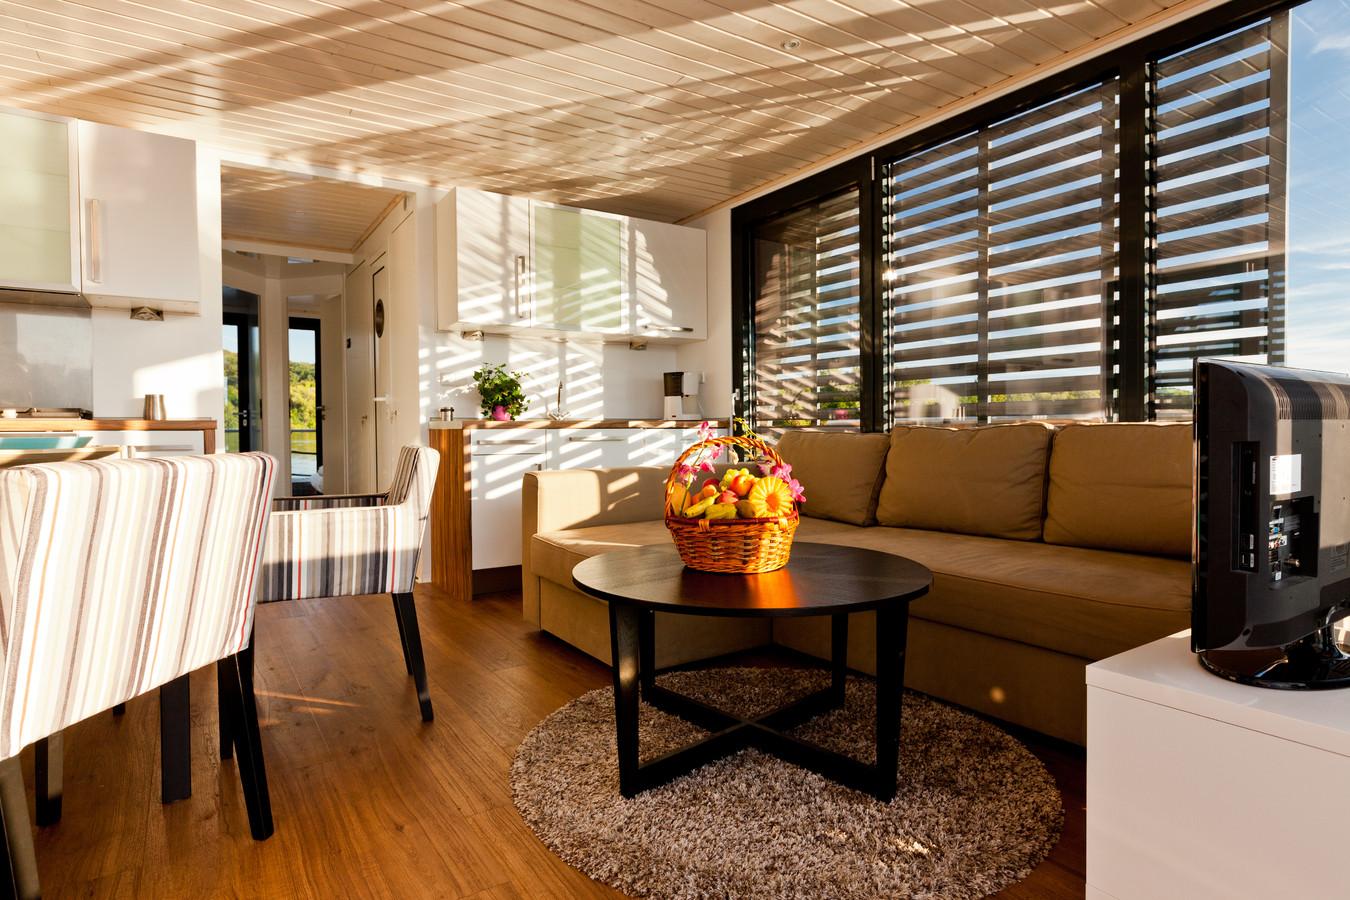 nautilus hausbootcharter hausboot mieten in berlin. Black Bedroom Furniture Sets. Home Design Ideas